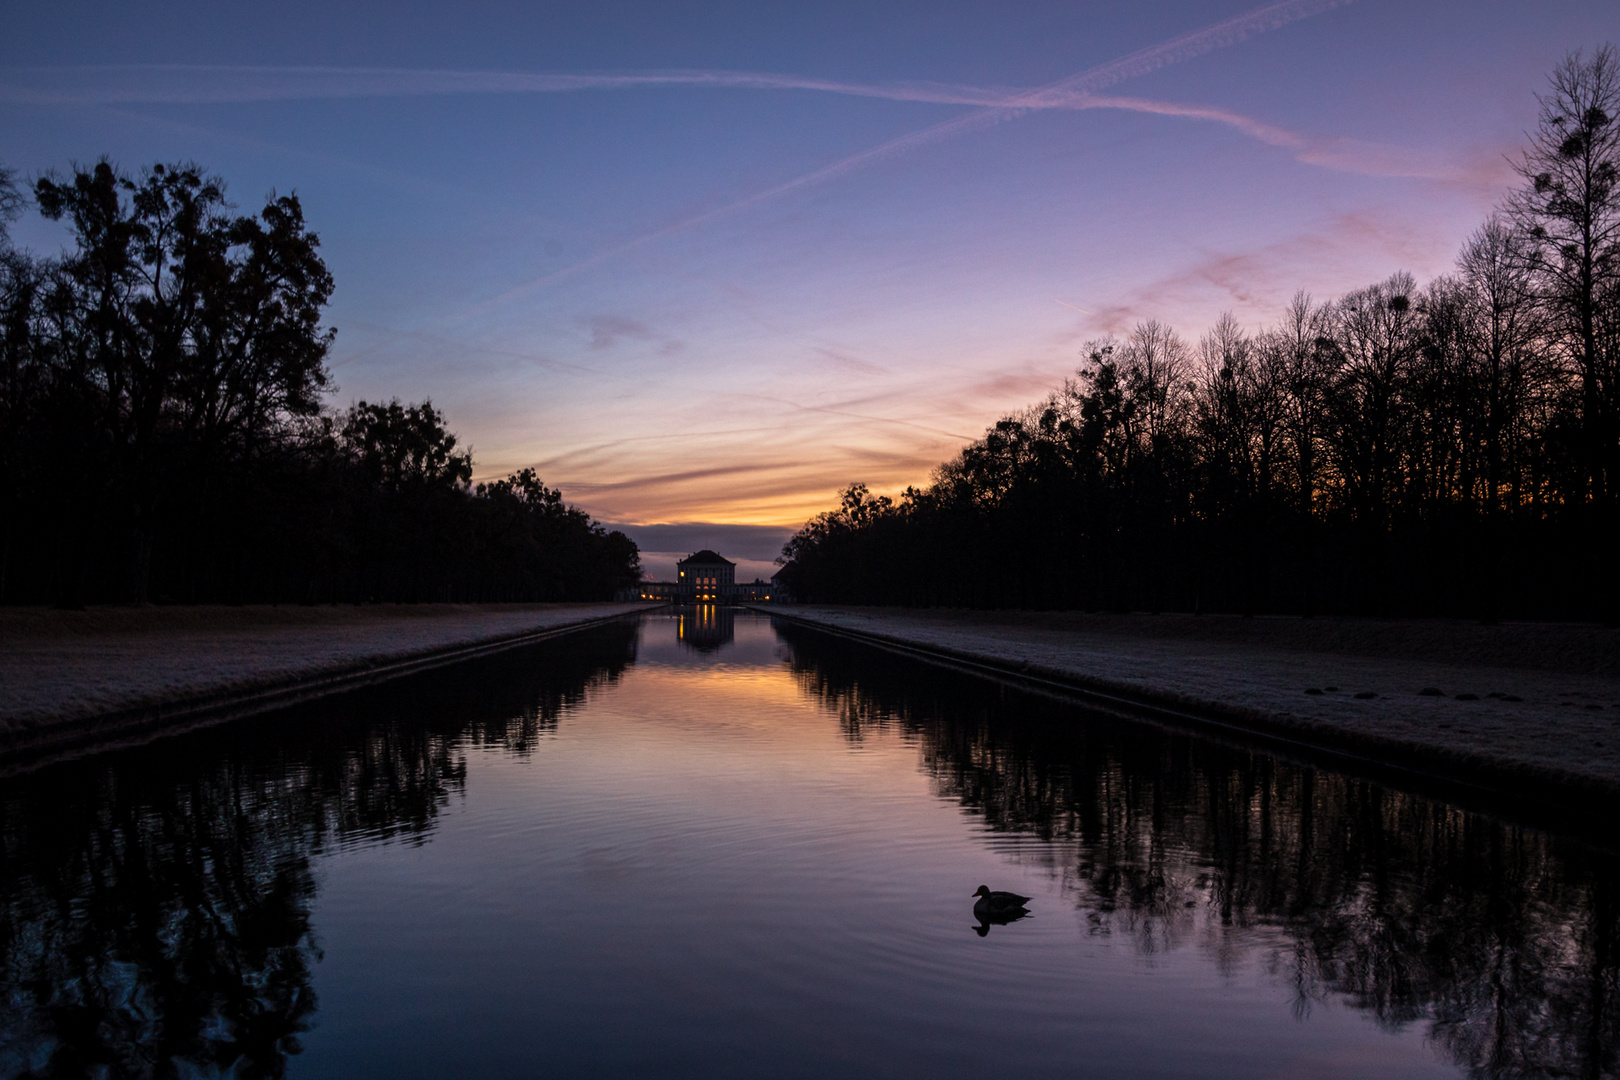 Morgens im Park (13.01.2020, 07:29 Uhr)